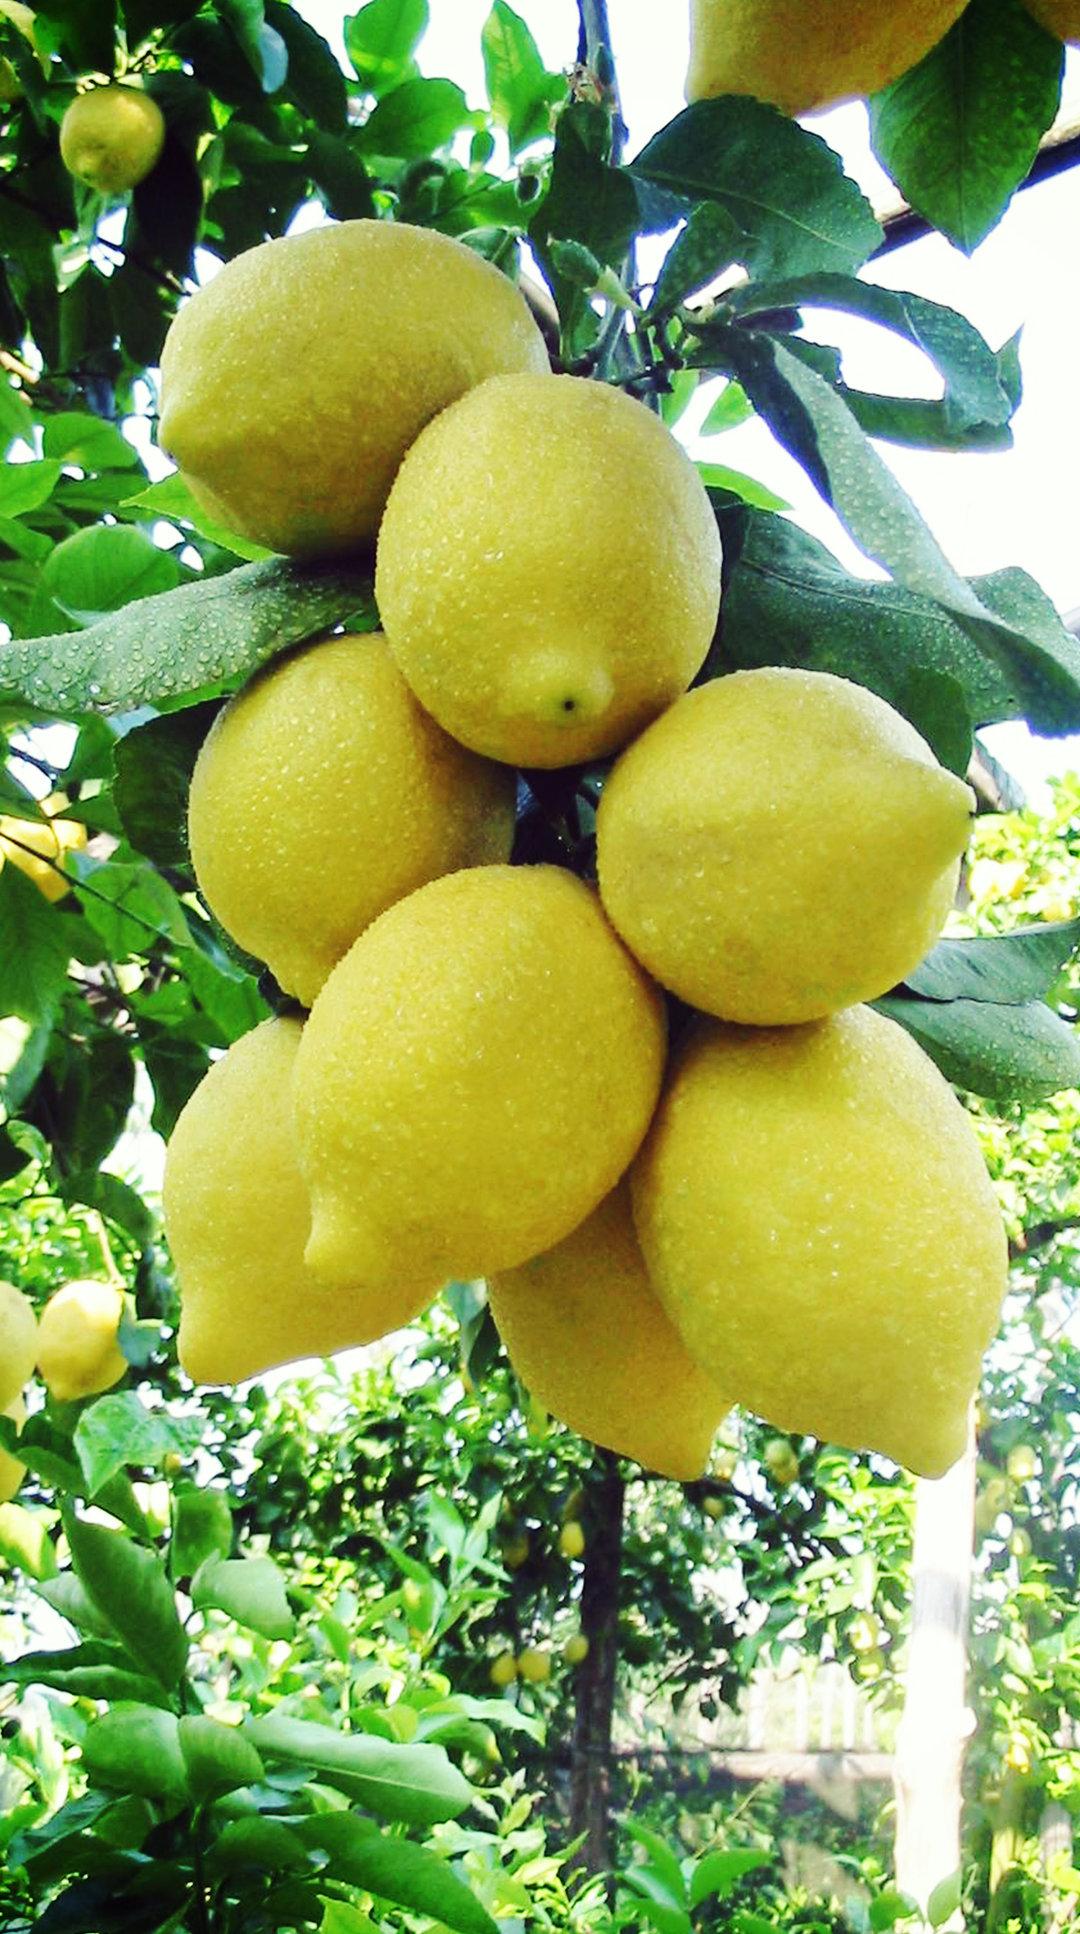 IGP Sorrento lemon